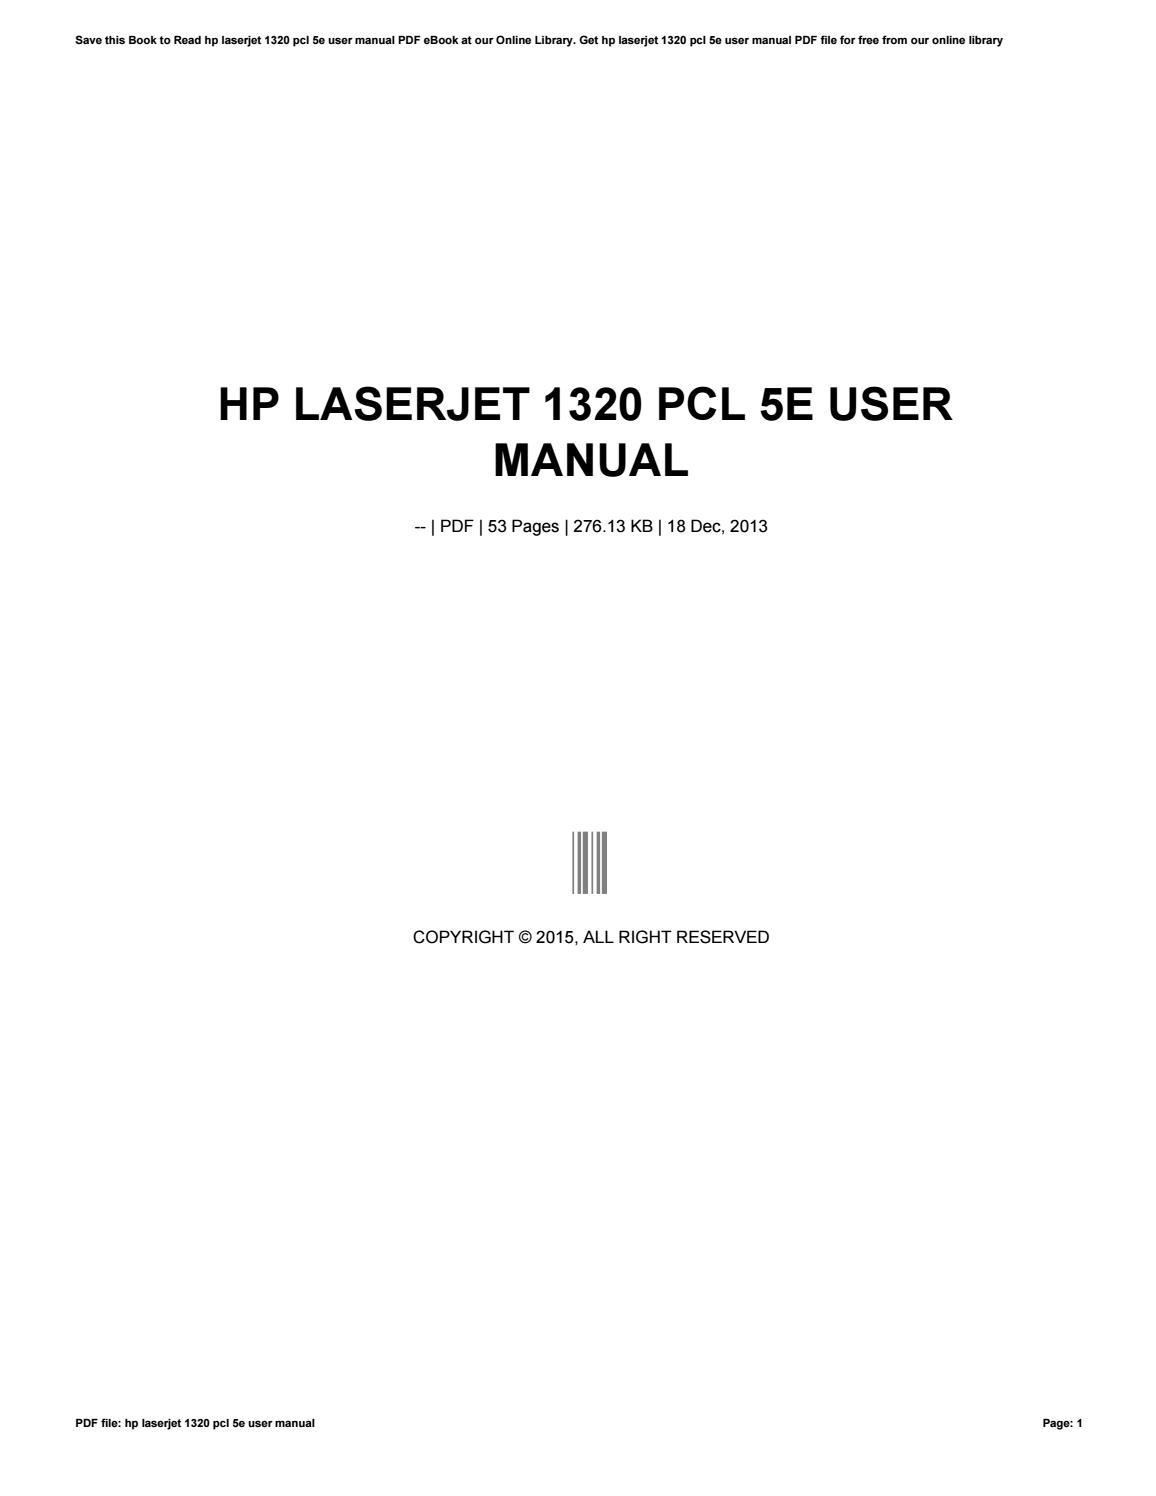 Hp laserjet 1320 pcl 6 user manual by lewisrivera3323 issuu.